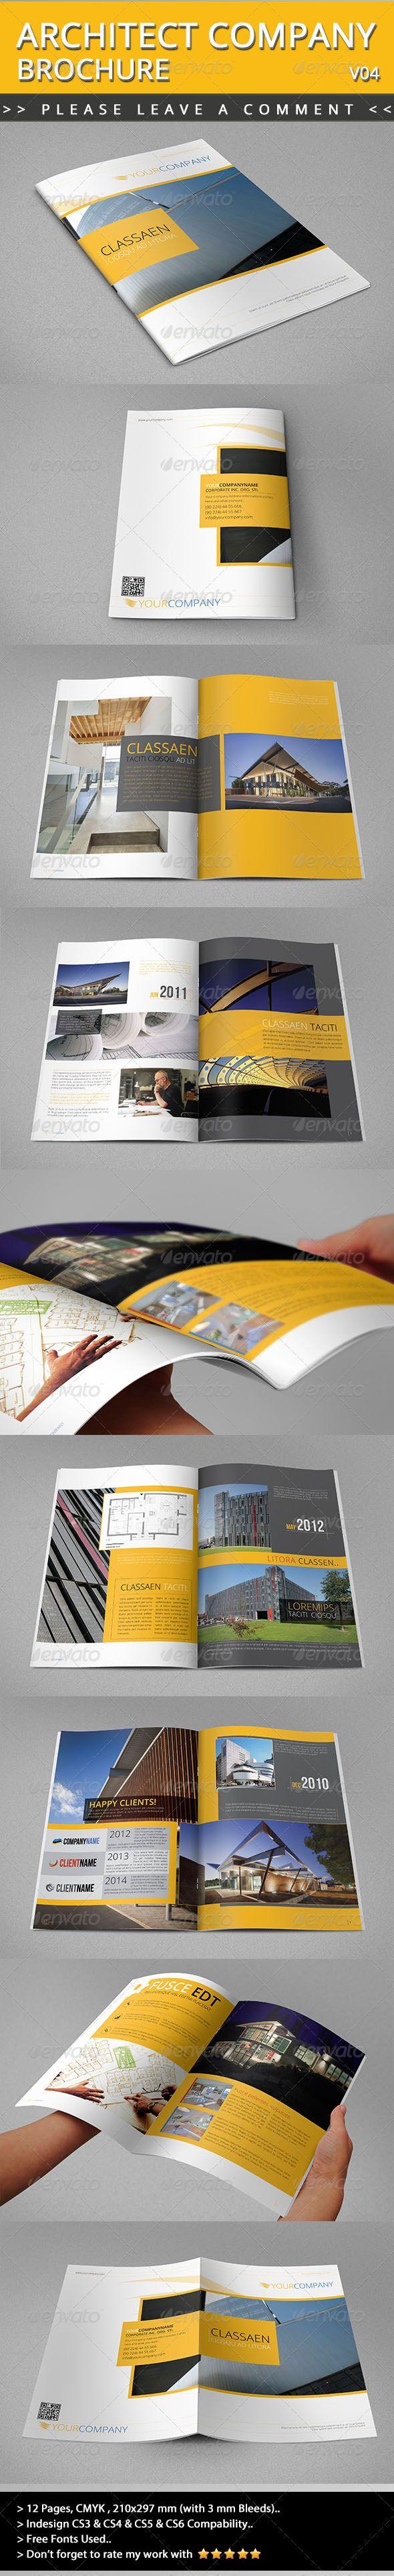 Architecture Brochure V04 - Corporate Brochures